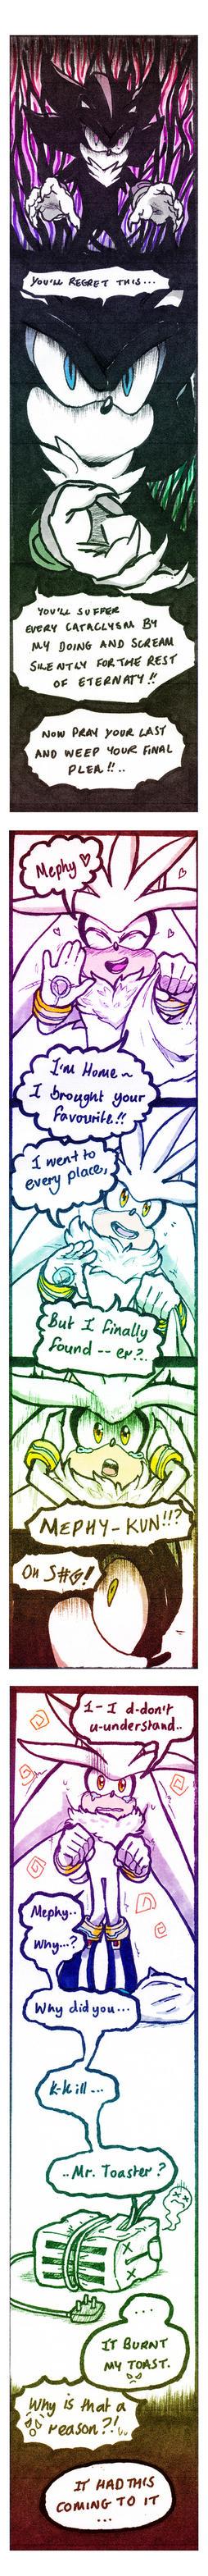 Mephilver Comic by DawnHedgehog555